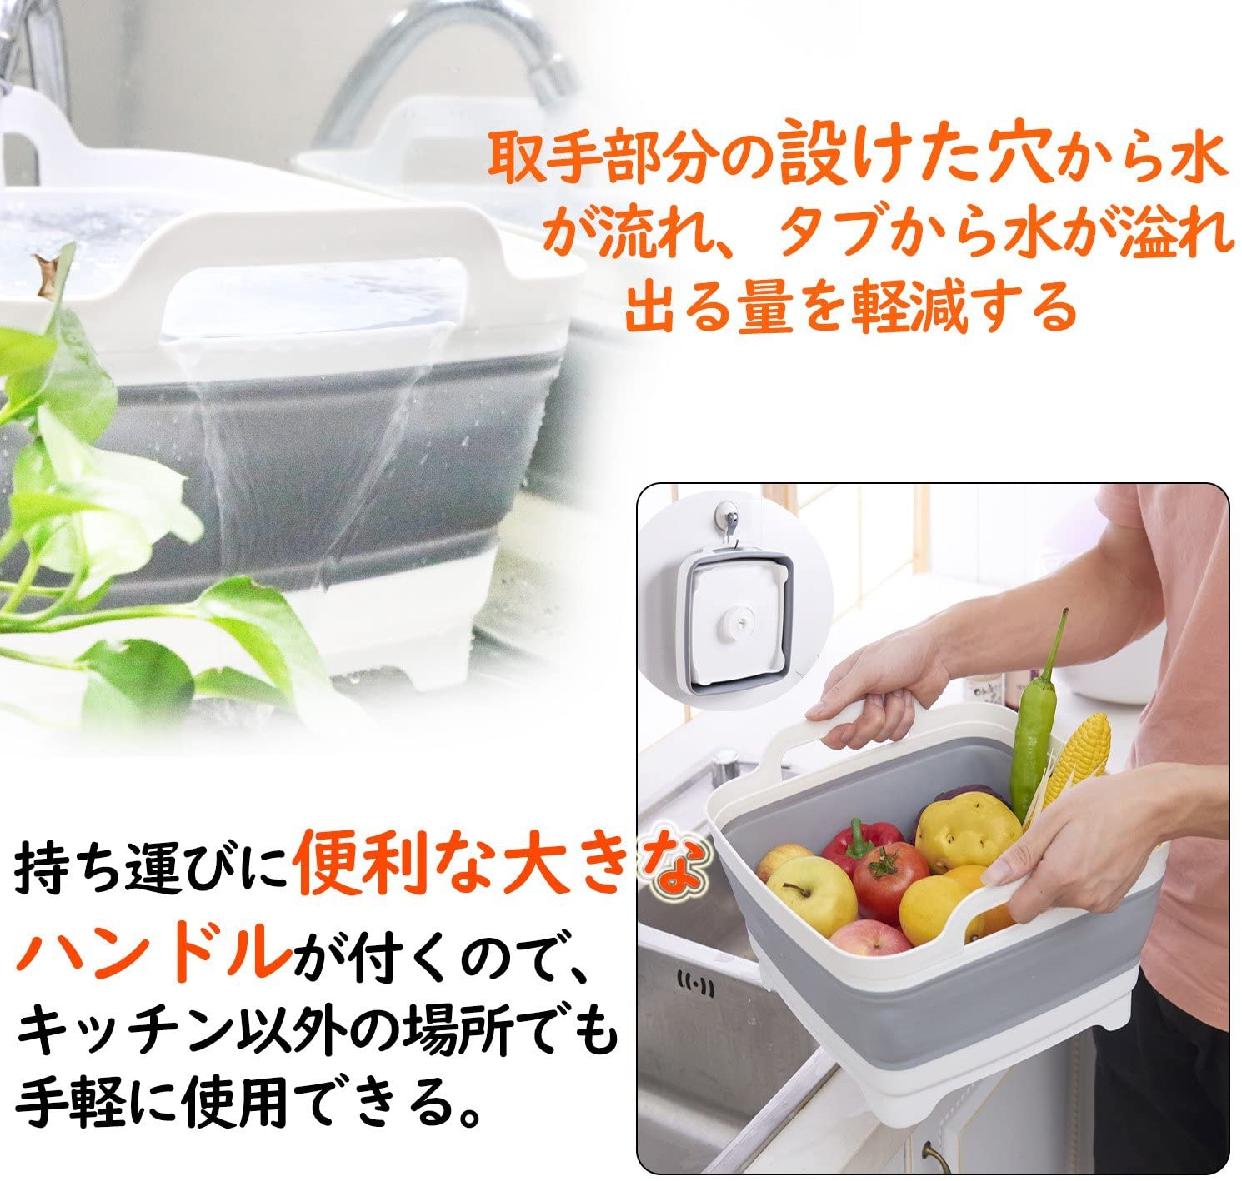 Hiveseen(ハイブシーン) 洗い桶 折りたたみ 8Lの商品画像4